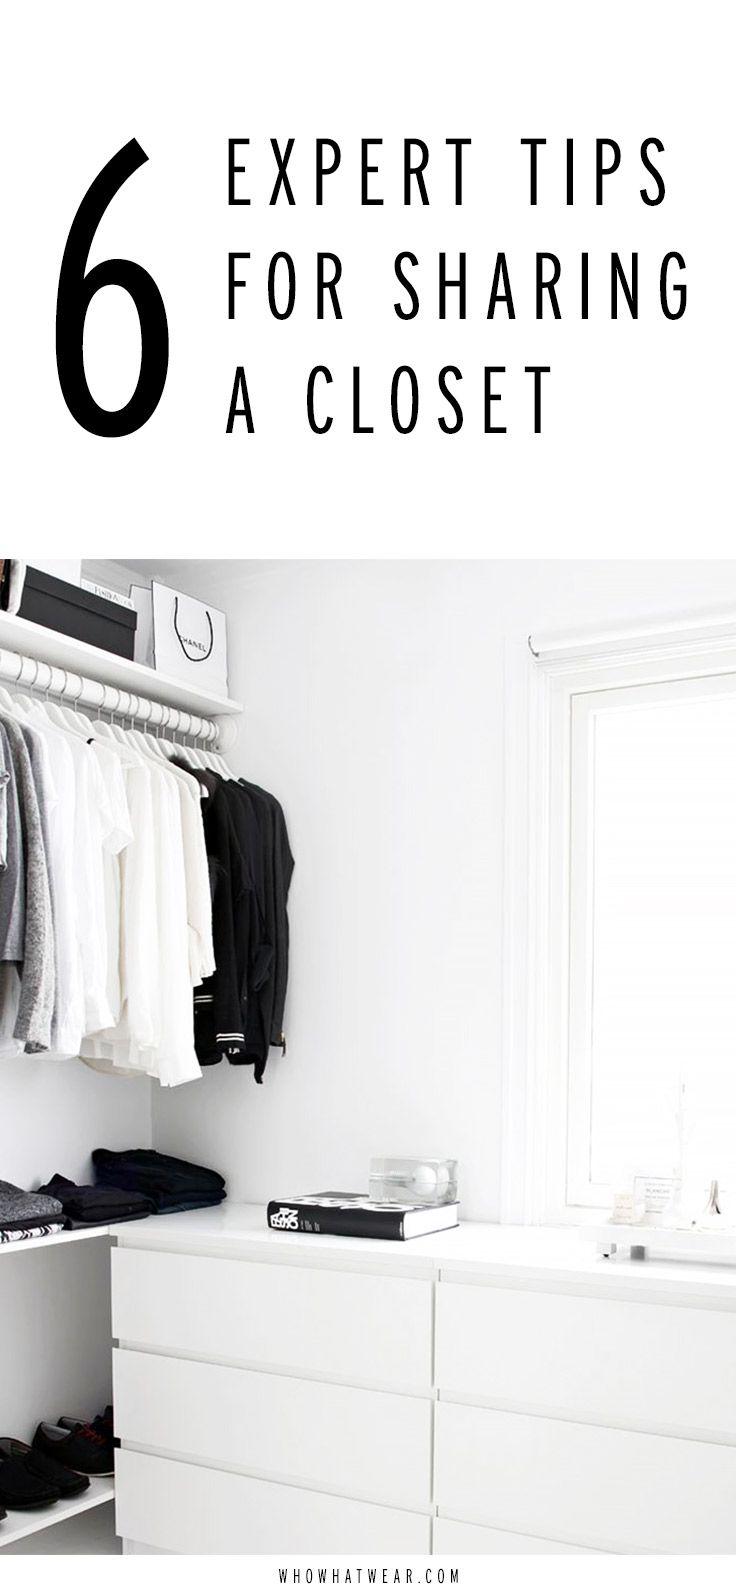 How to properly share a closet